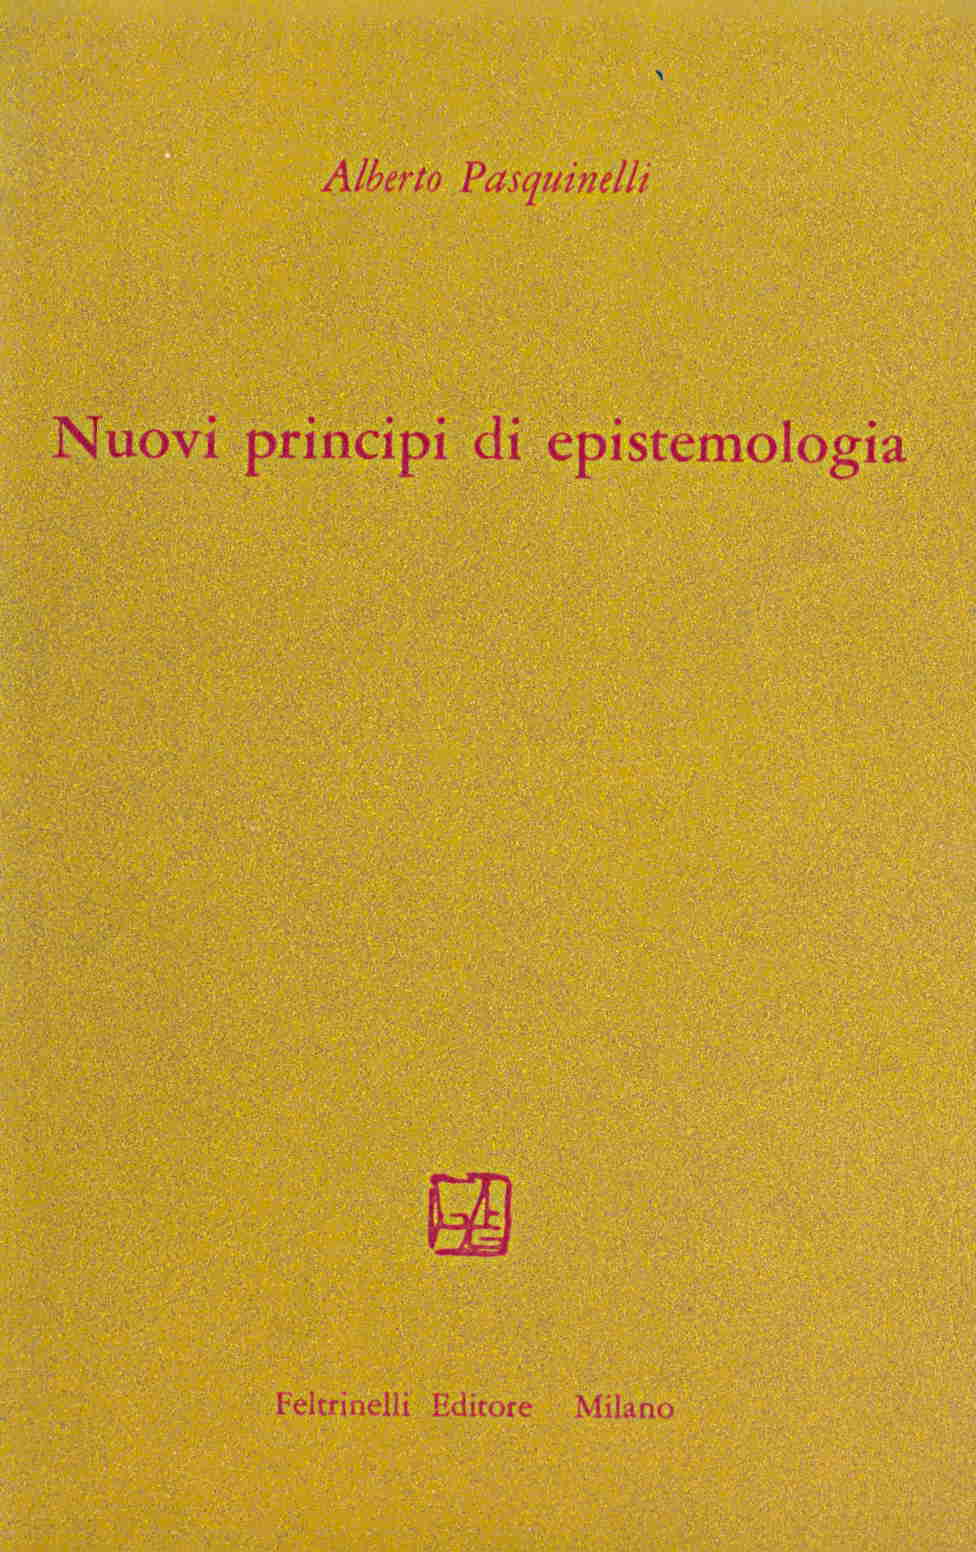 Nuovi principi di epistemologia